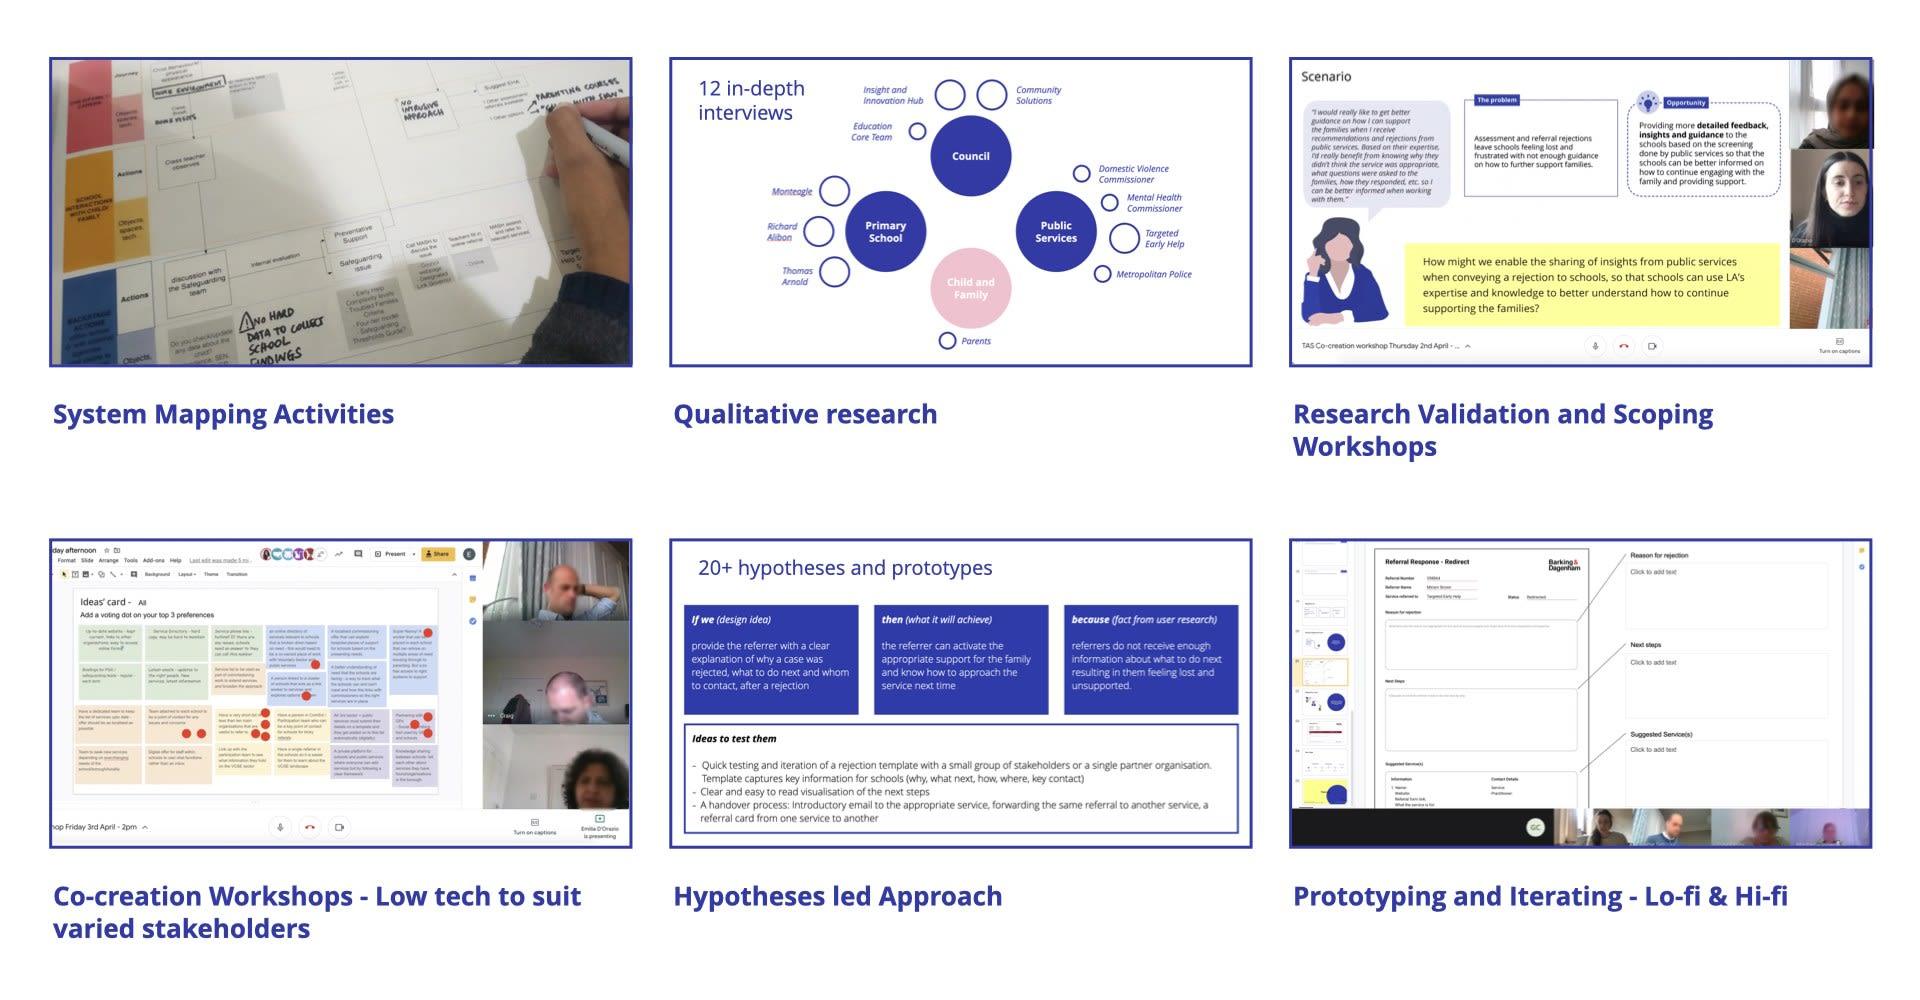 Process and Methodologies